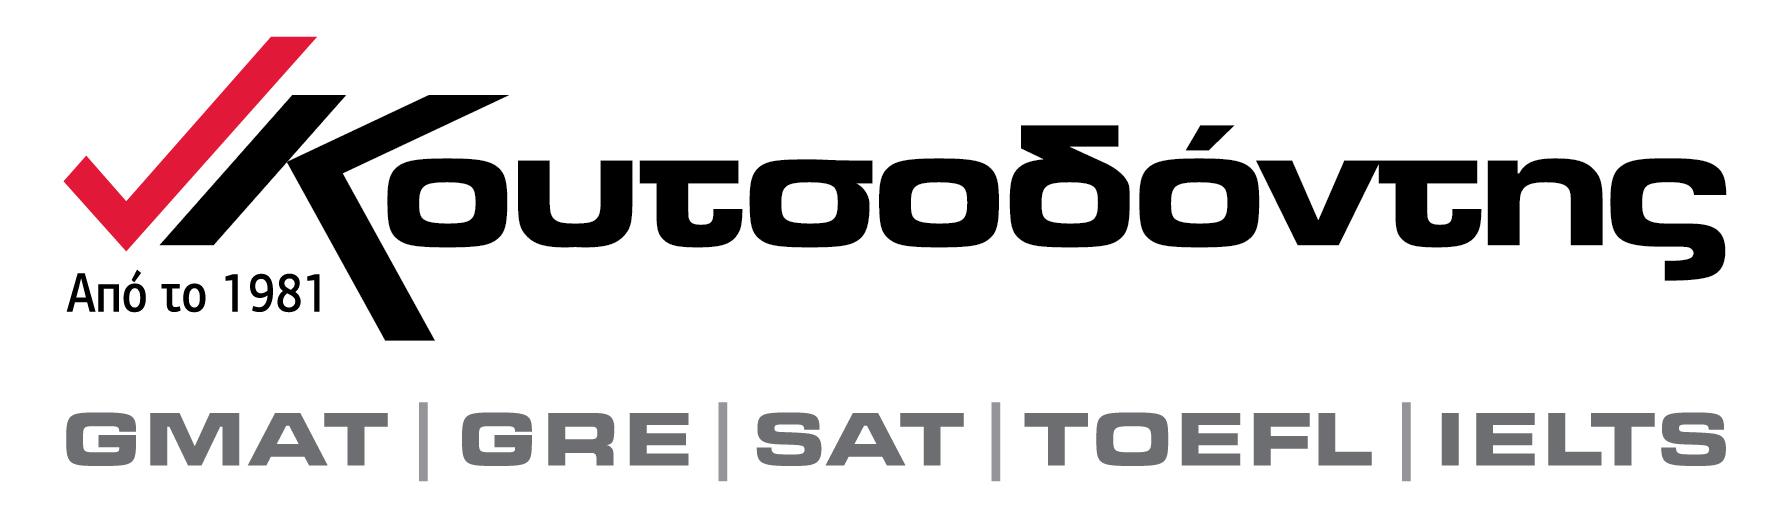 koutsodontis-logo